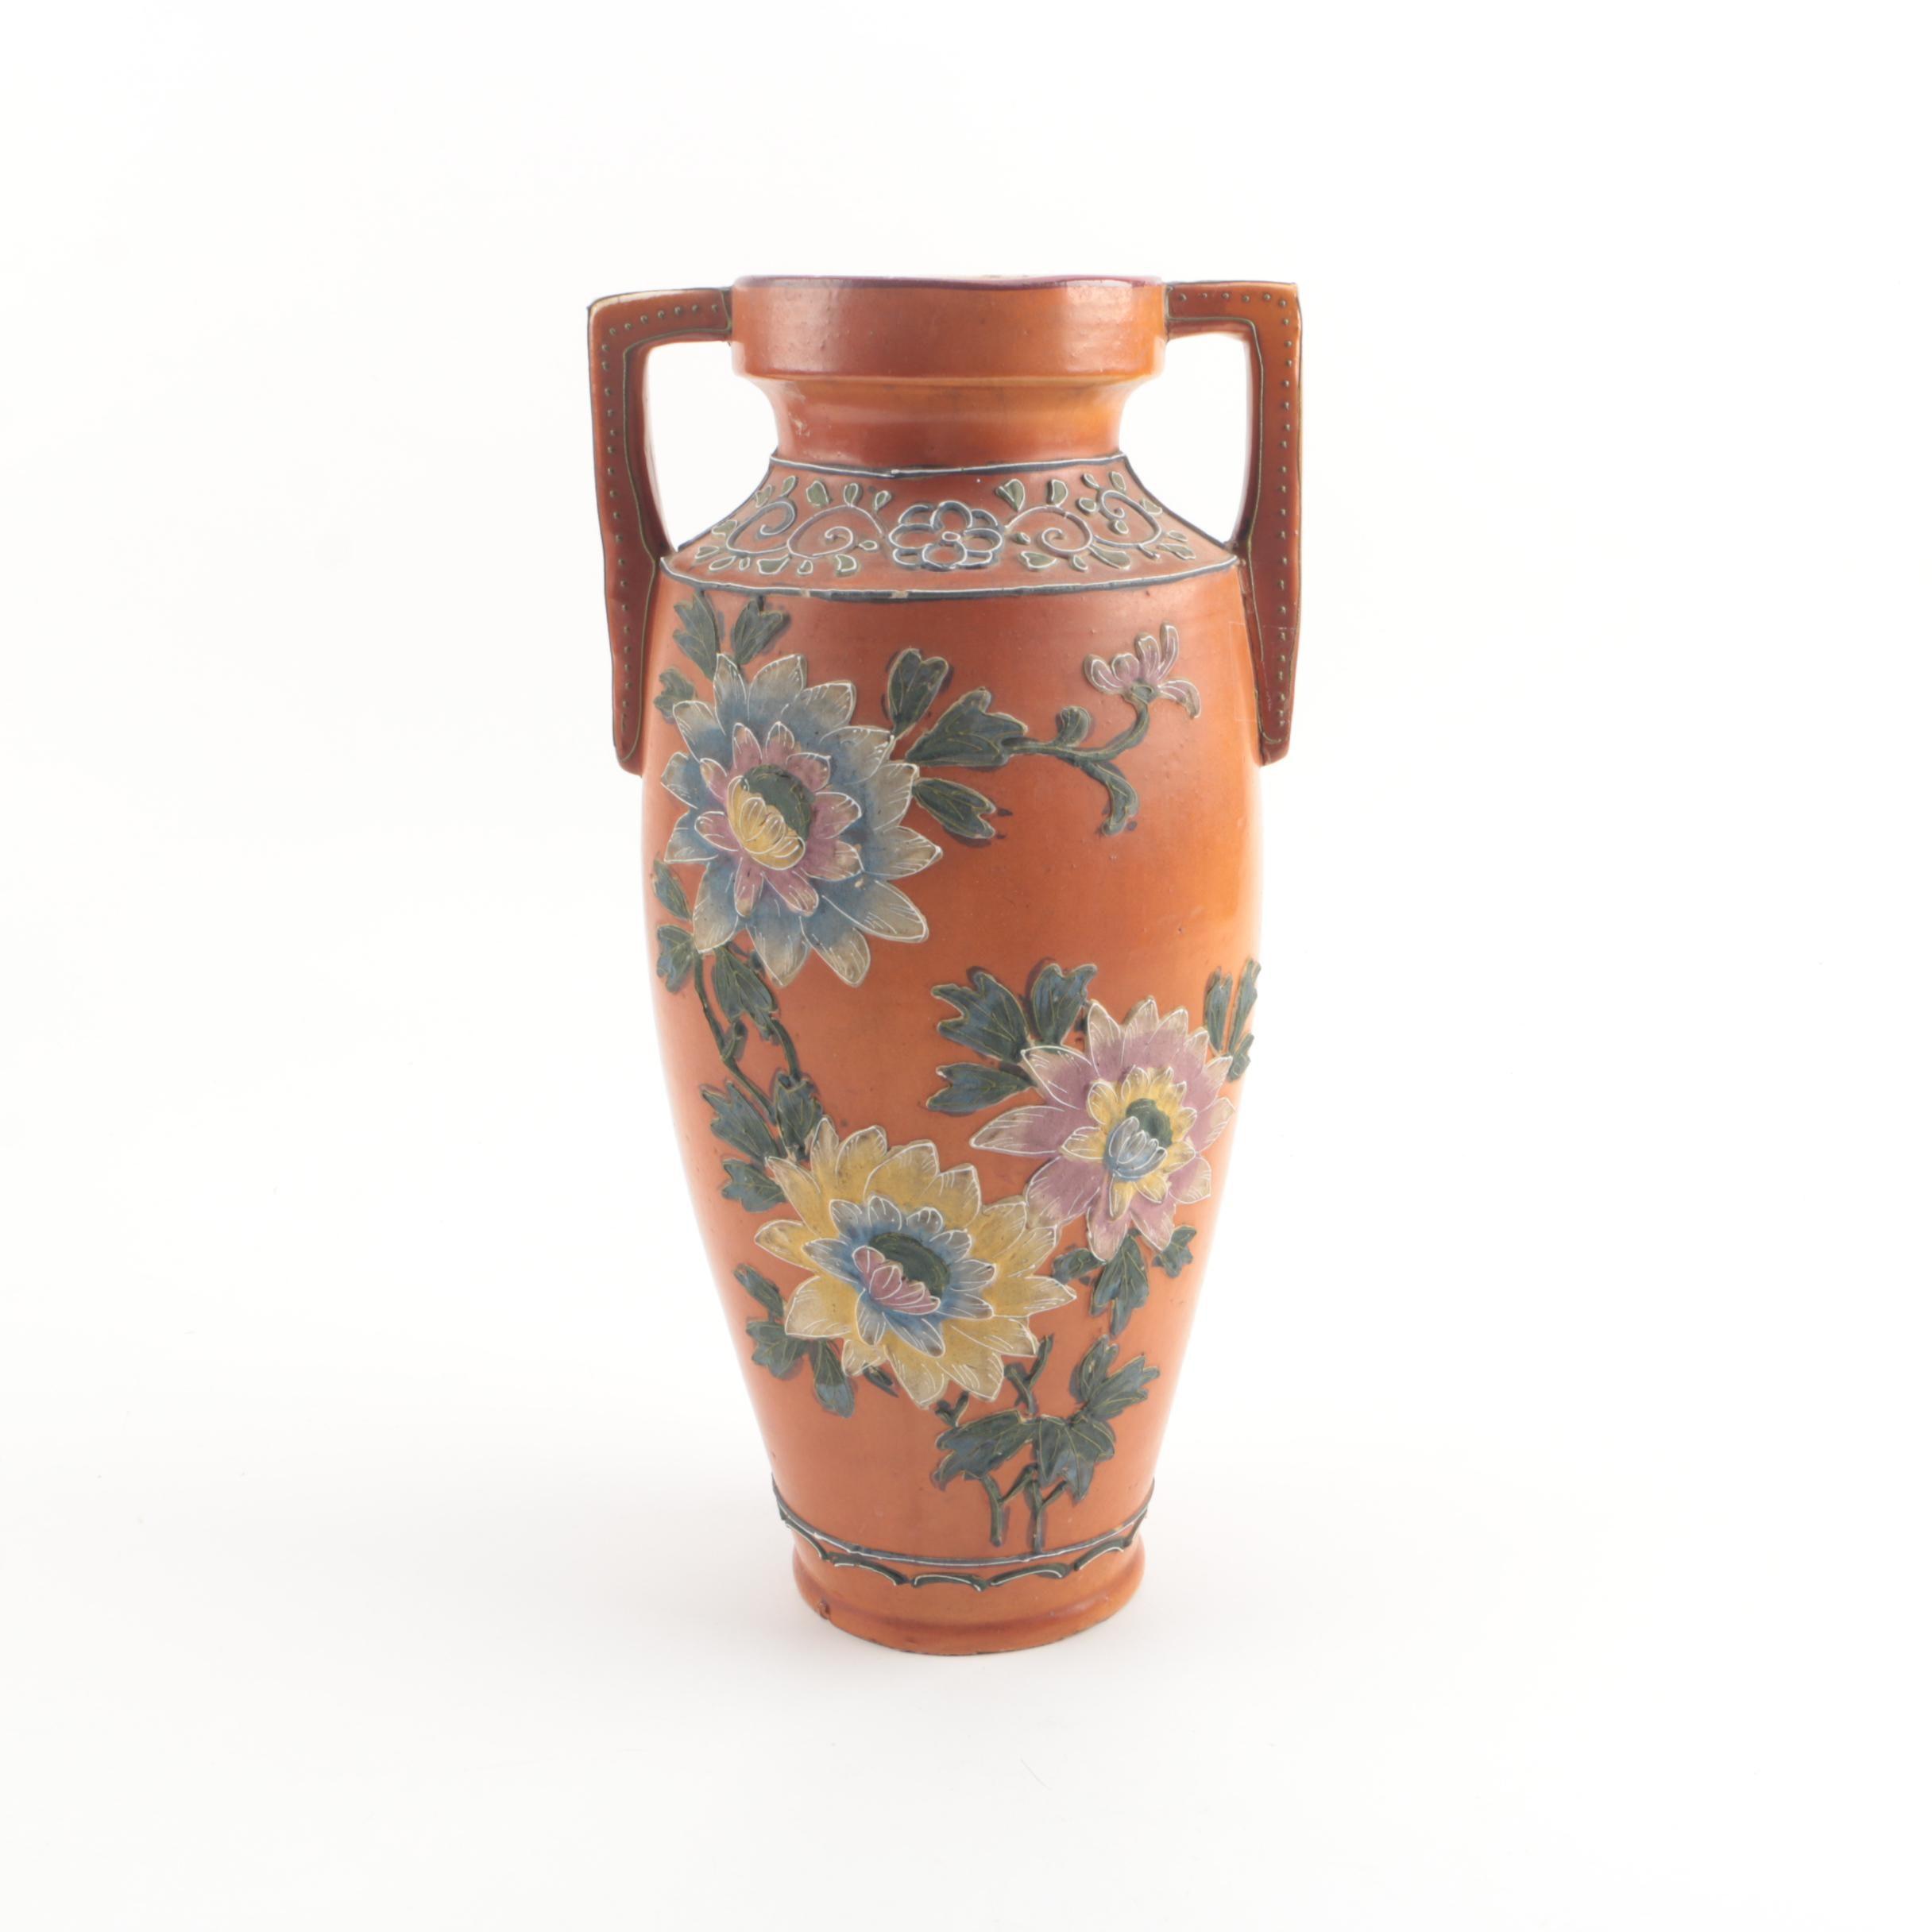 Vintage Japanese Hand-Painted Floral Ceramic Vase Lamp Base